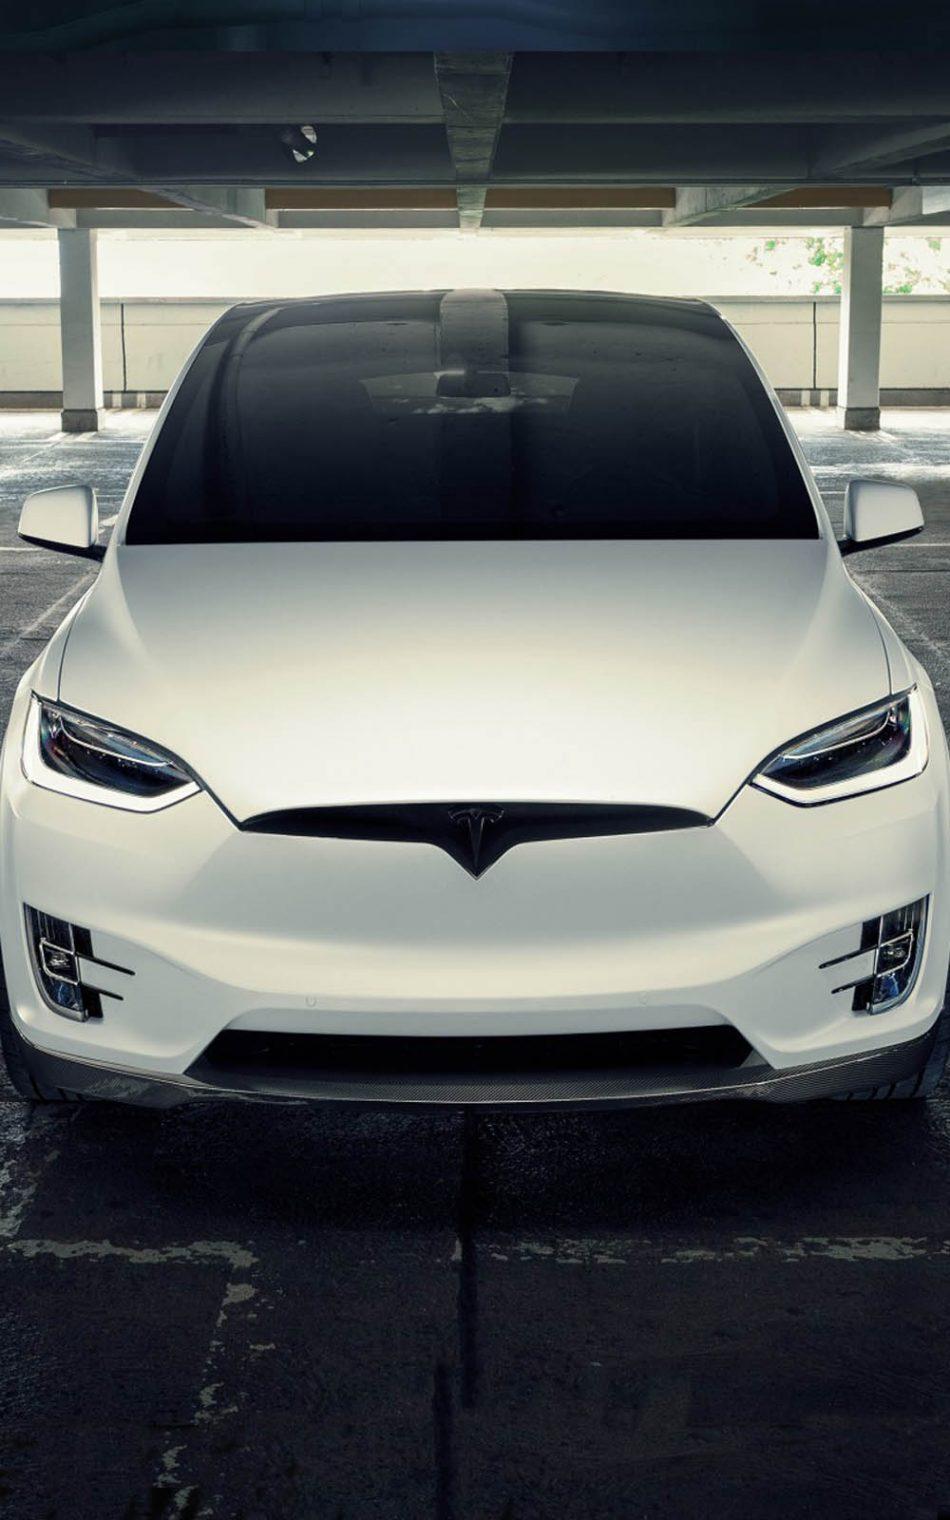 Download novitec tesla model x 2017 free pure 4k ultra hd mobile wallpaper - Tesla wallpaper android ...